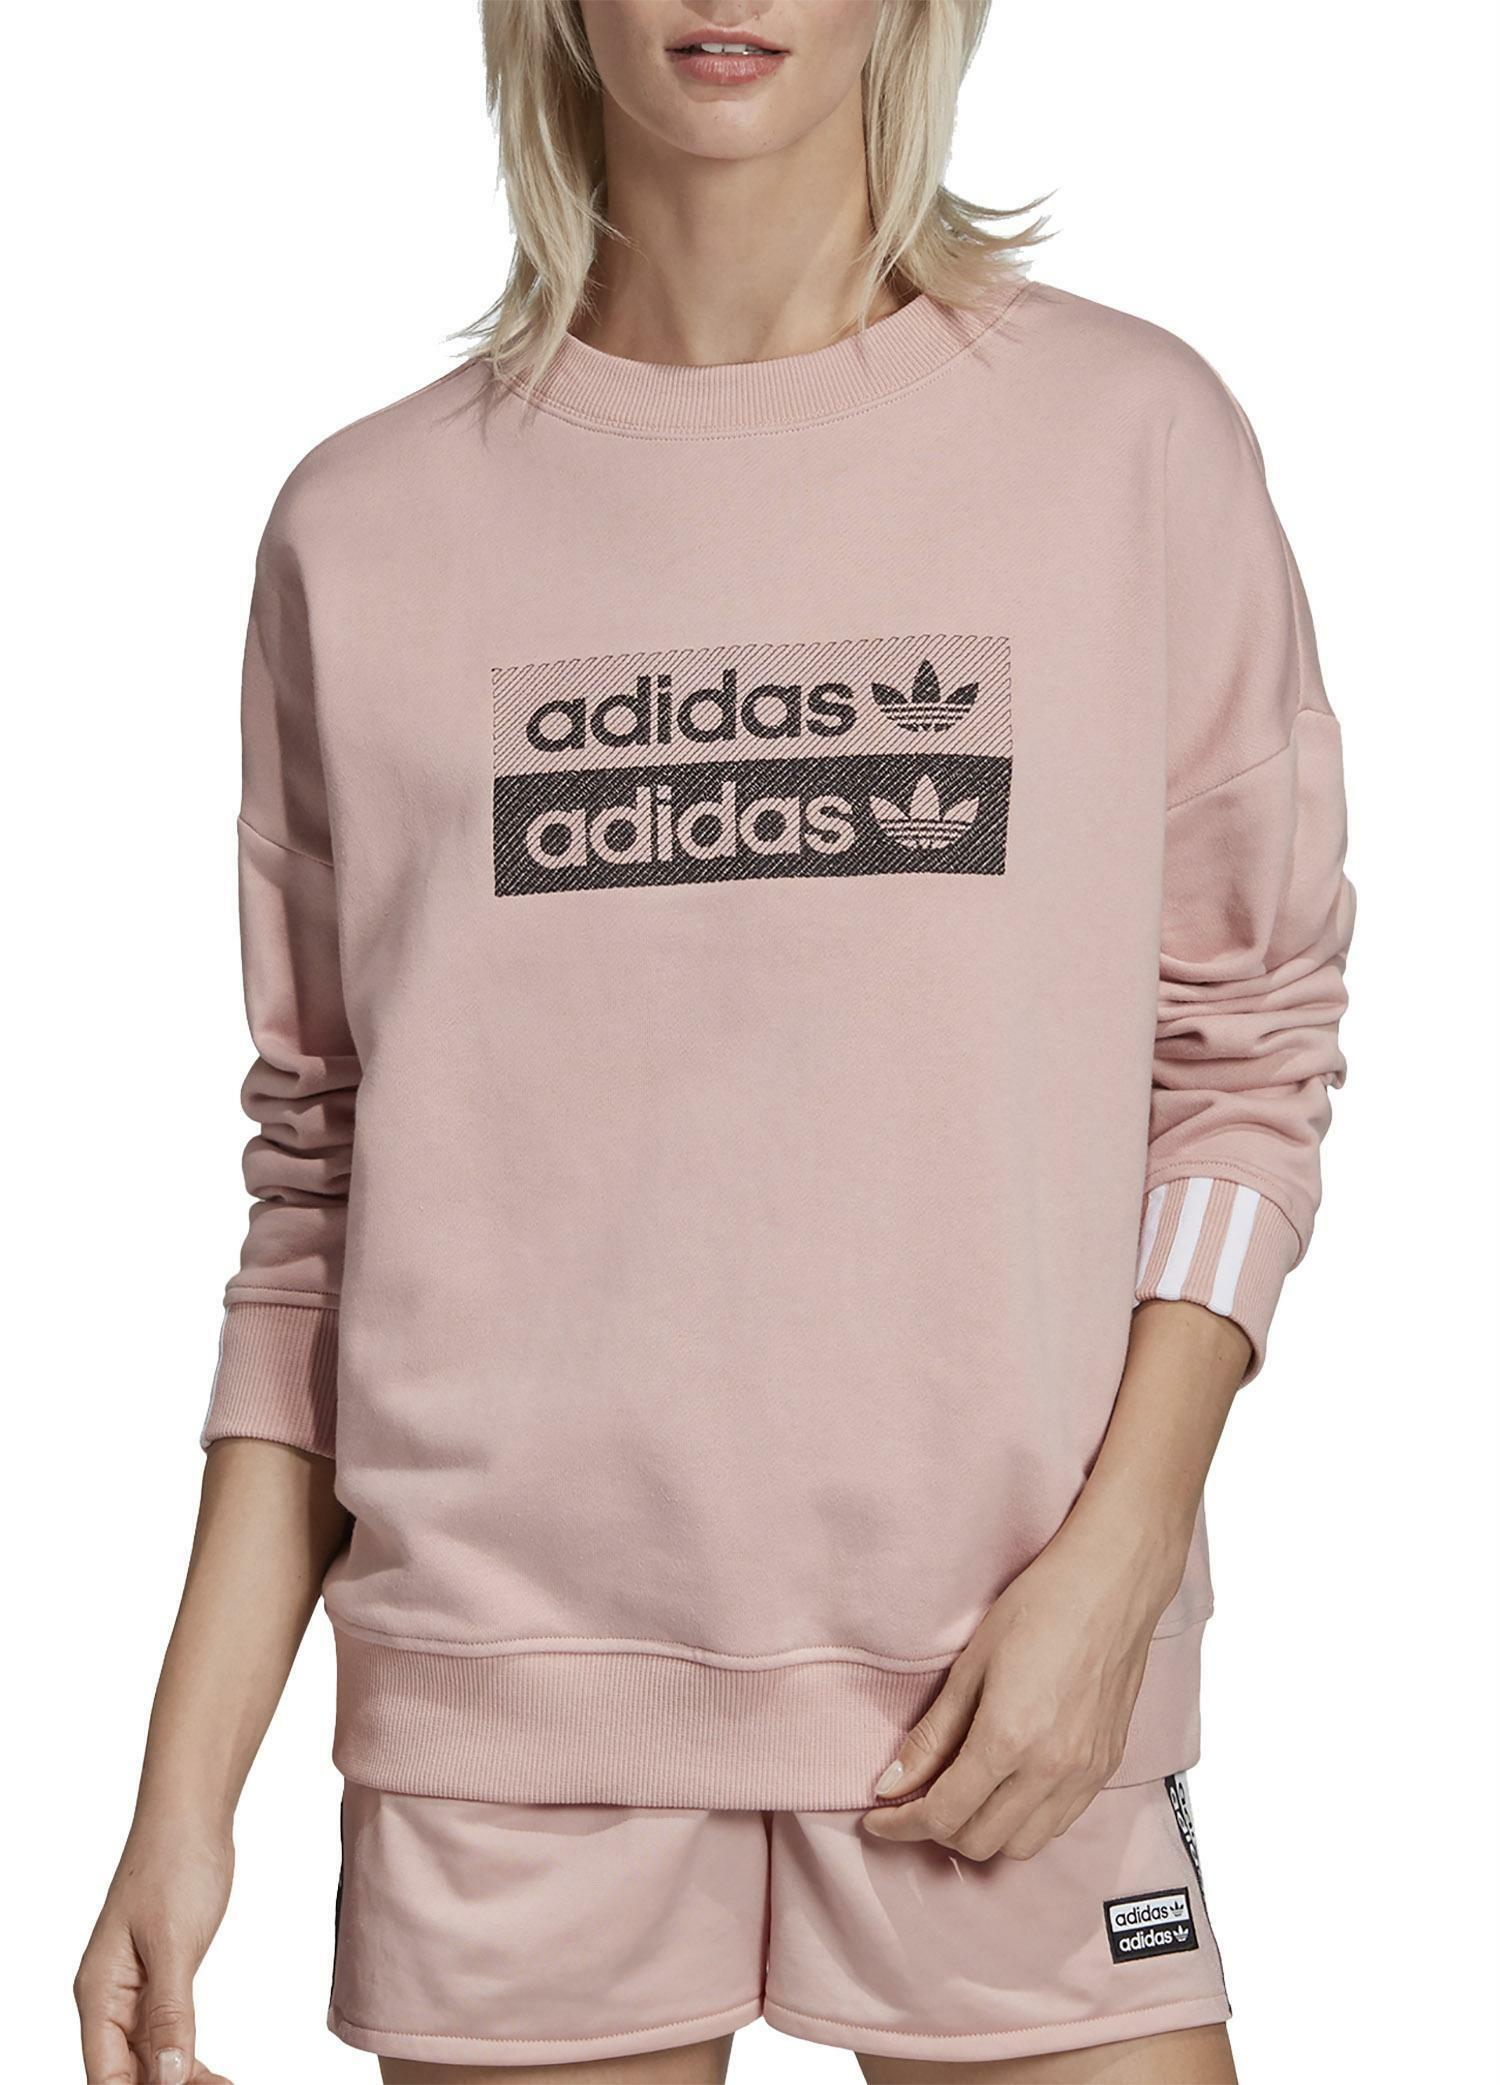 adidas felpa donna rosa